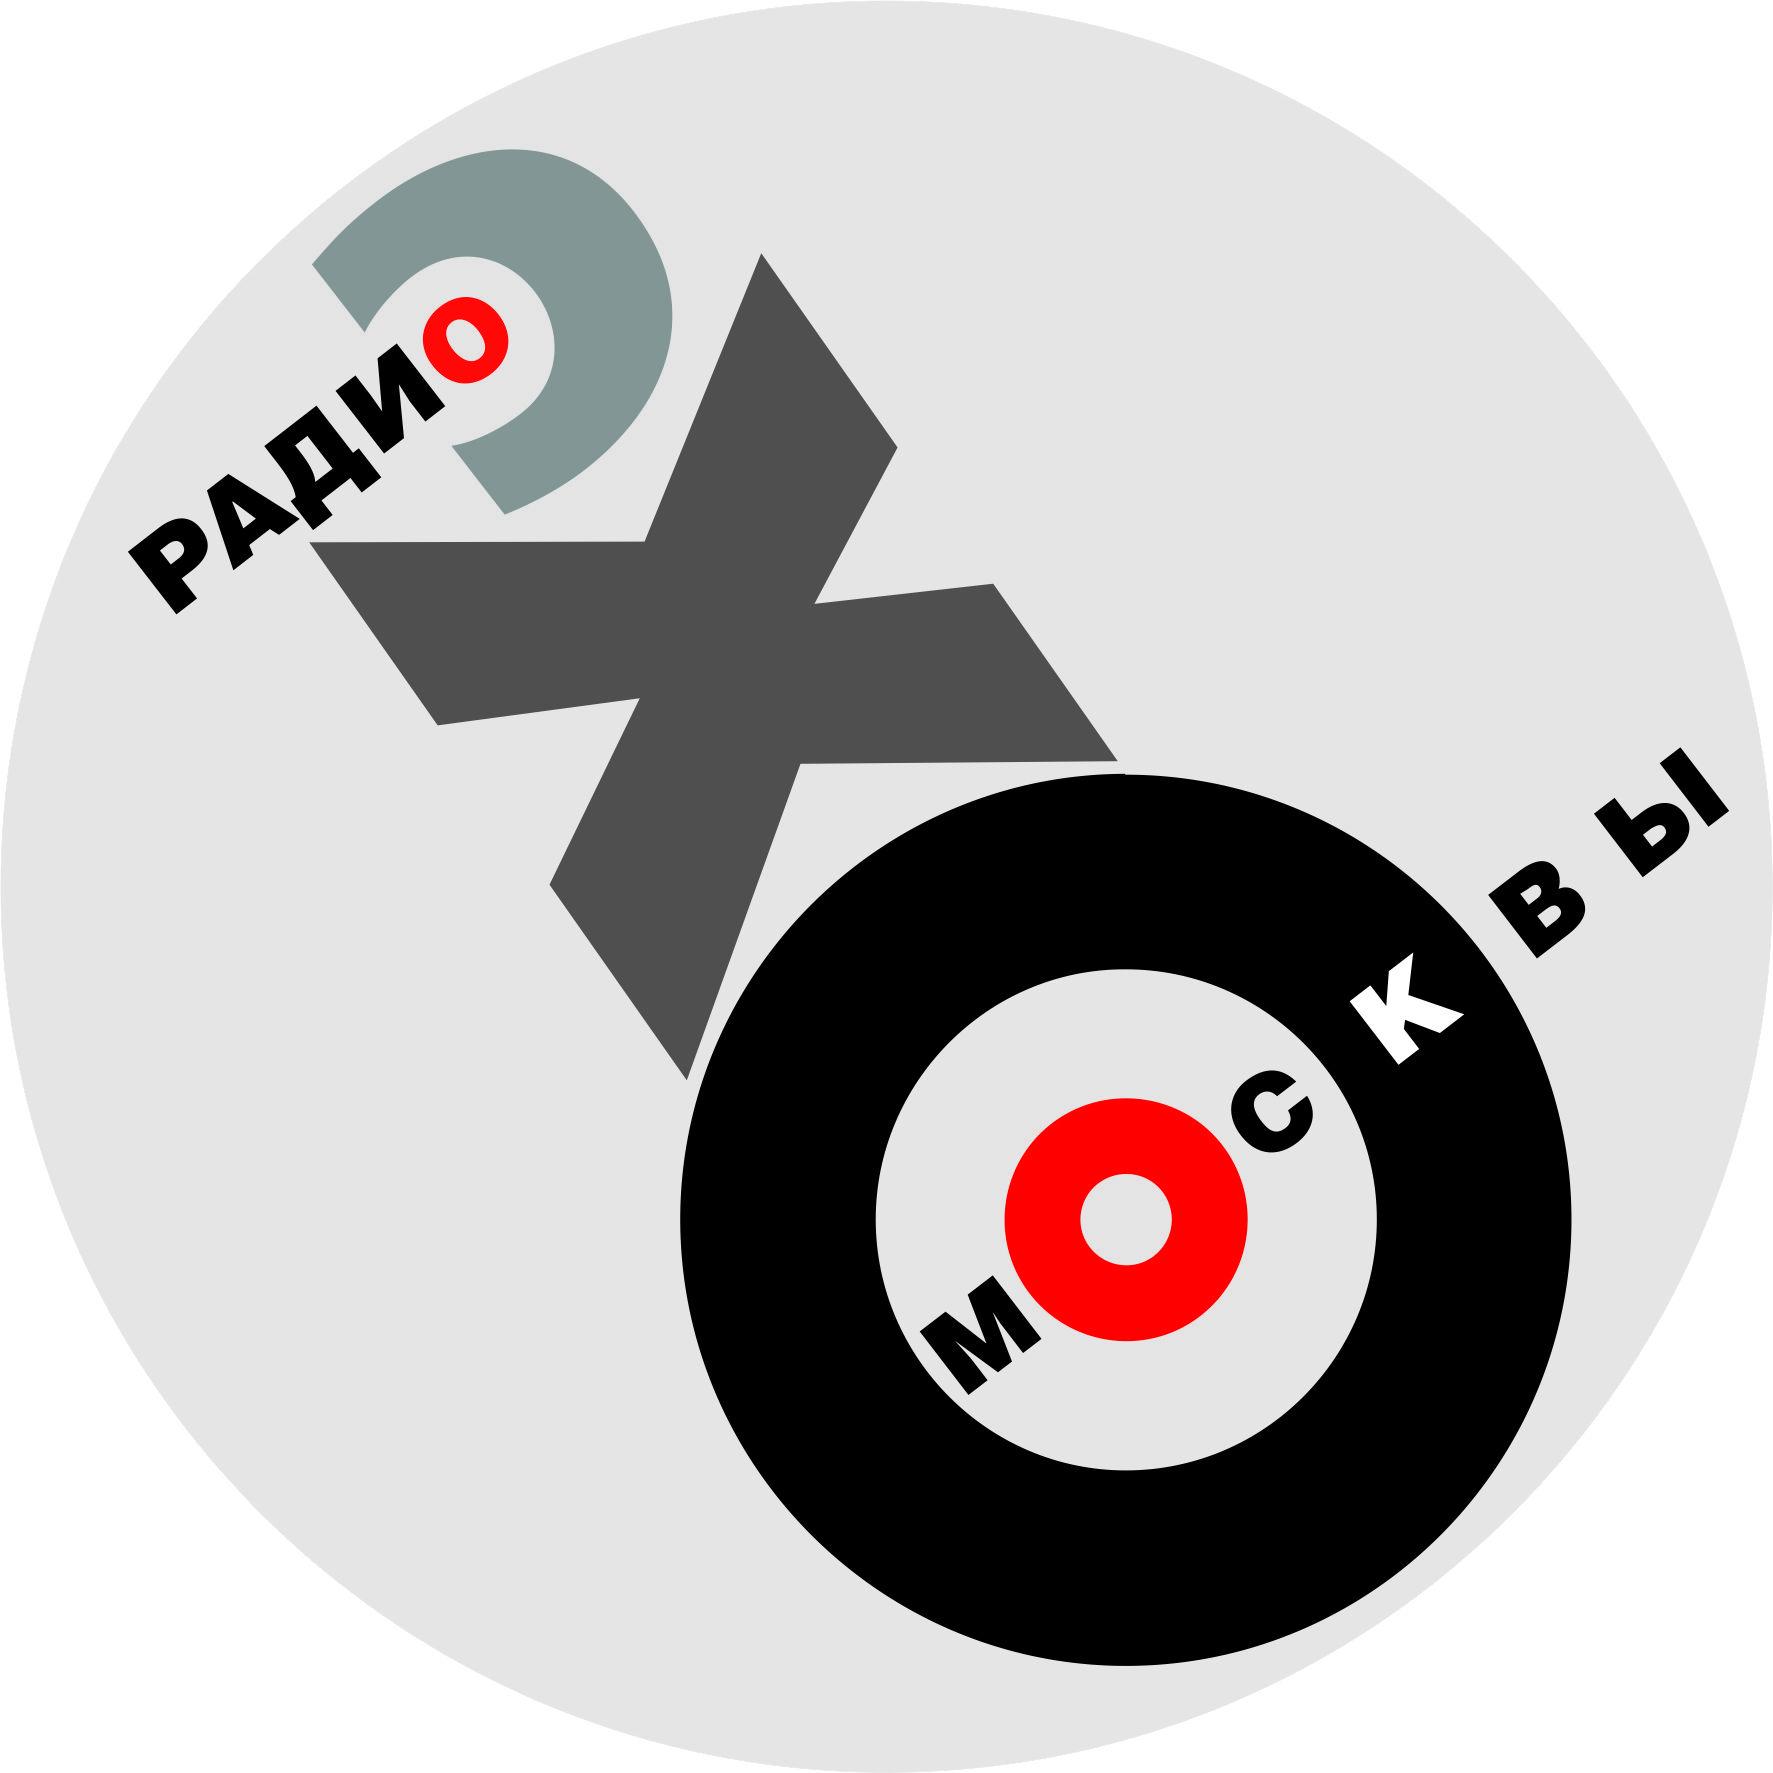 Дизайн логотипа р/с Эхо Москвы. фото f_9565623e8f038385.jpg